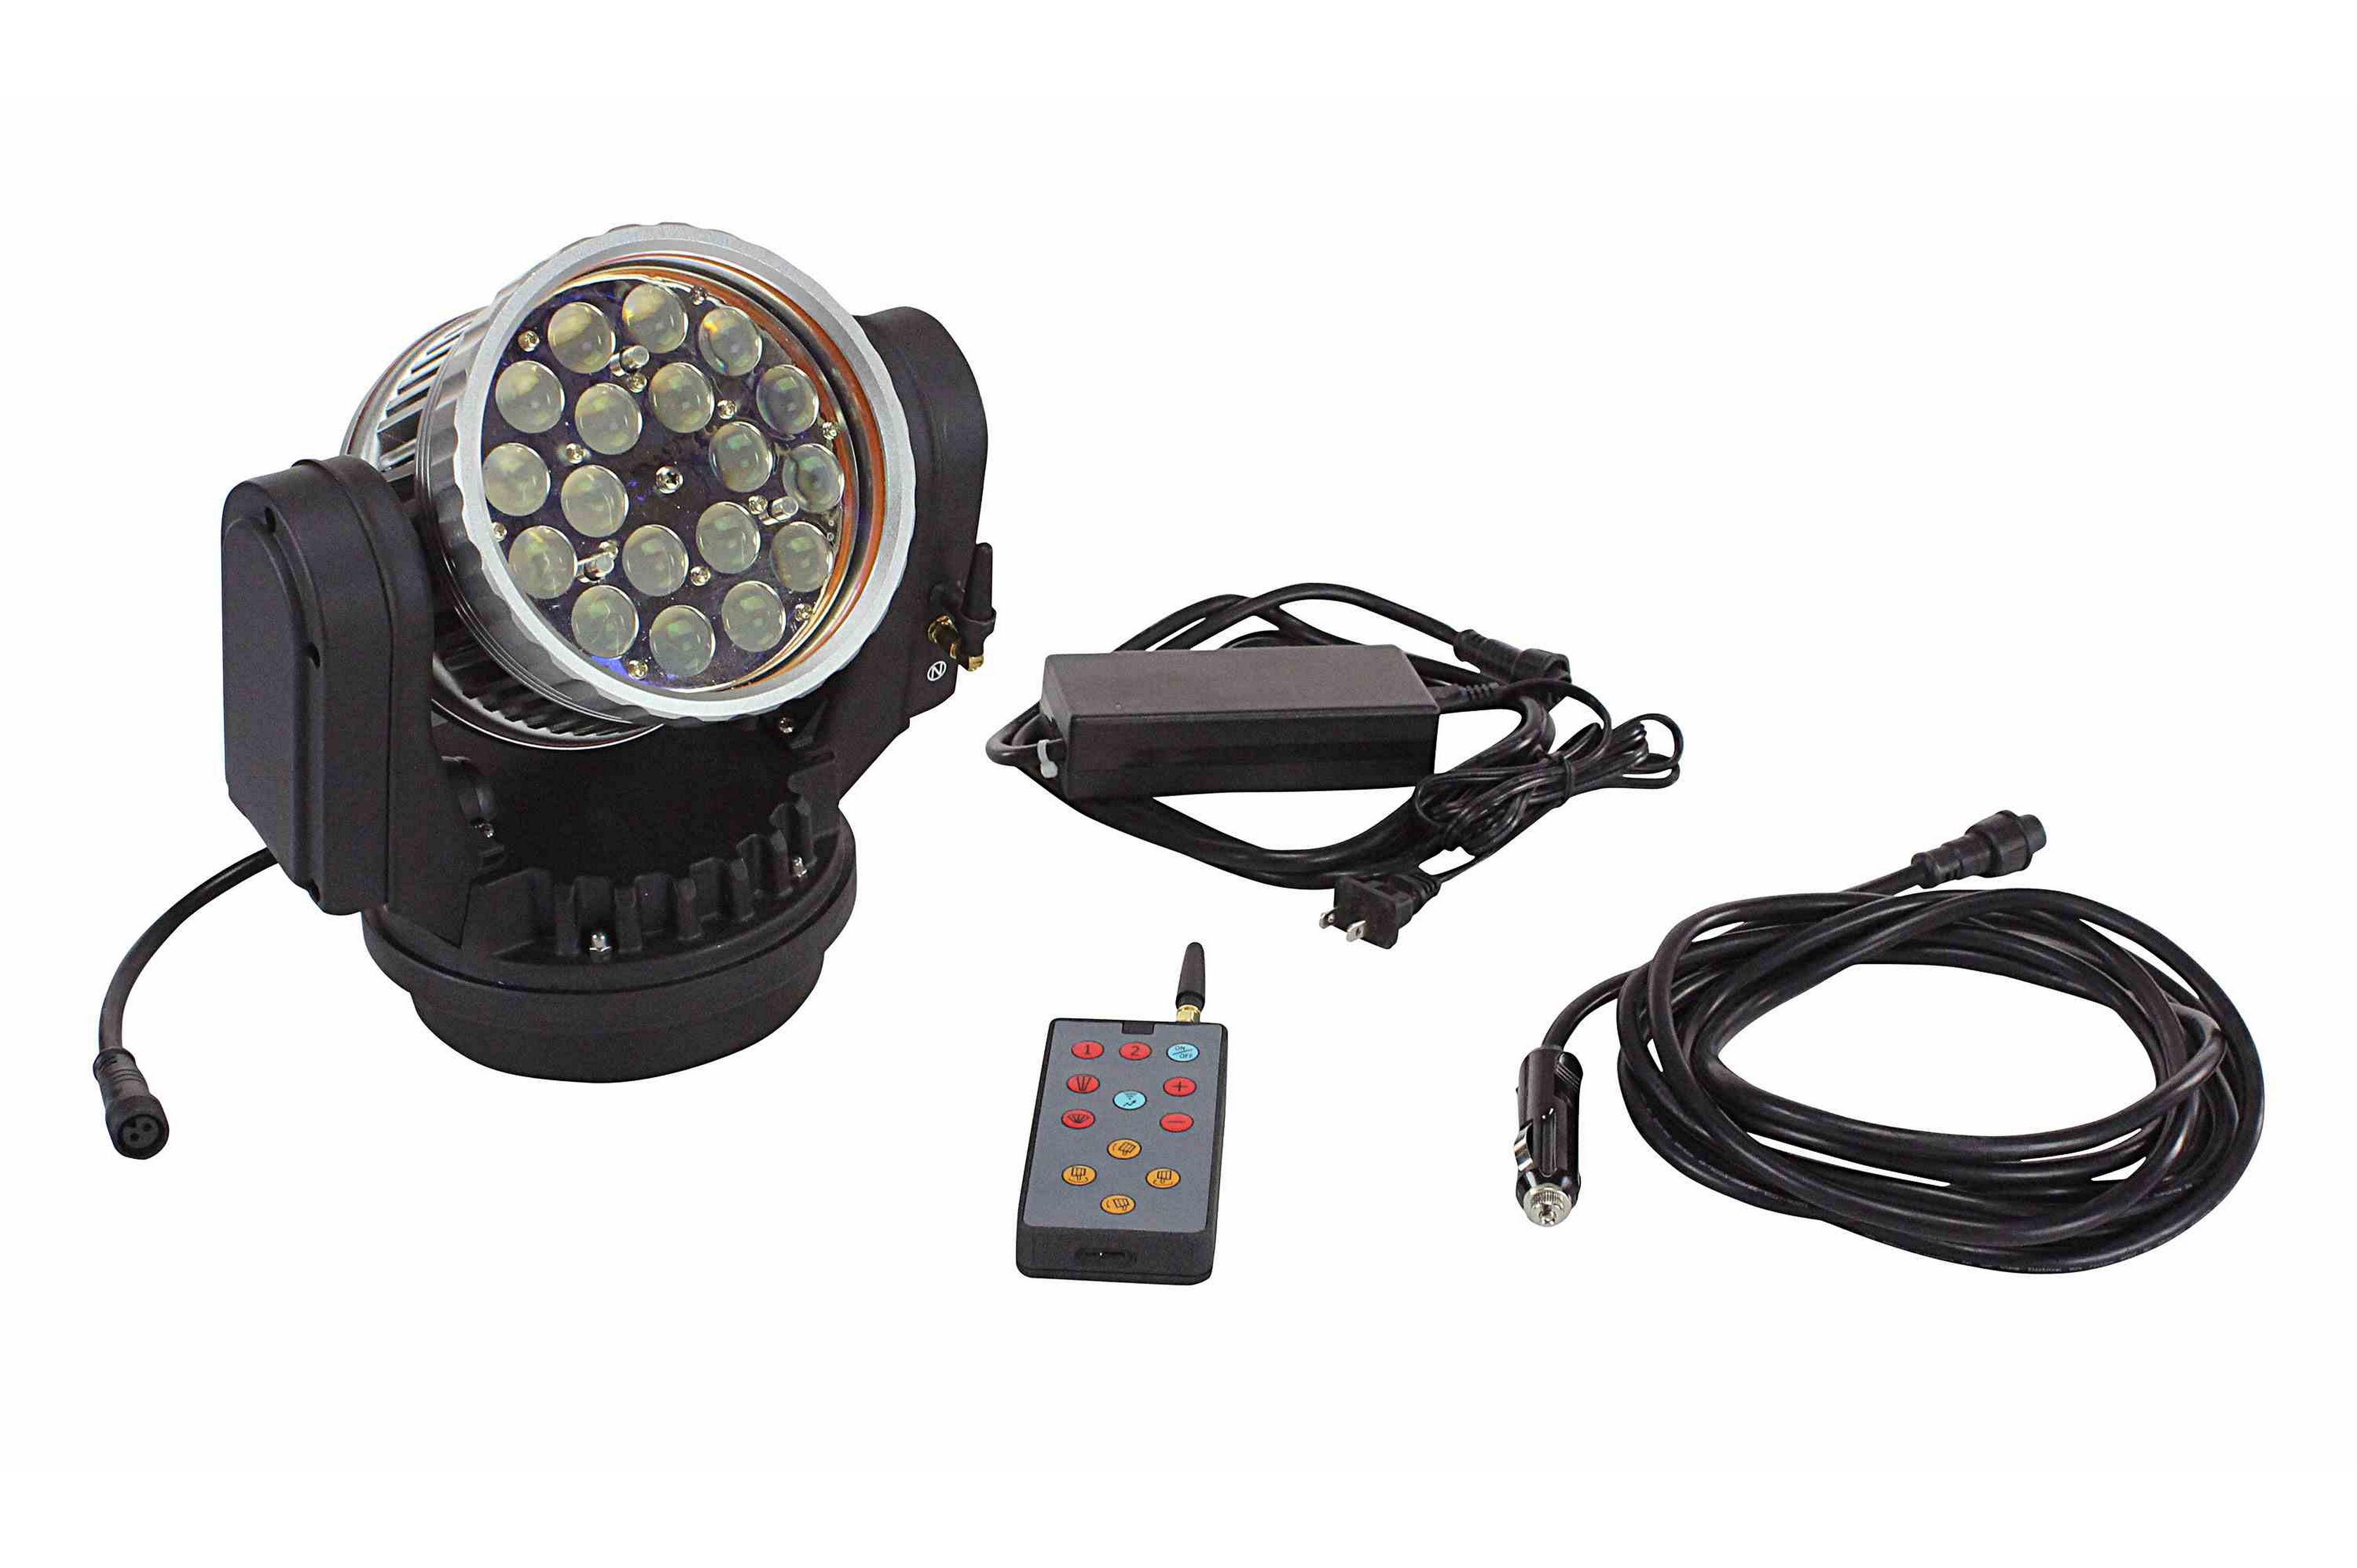 40 watt wireless remote control led spotlight 12 volt dc or 120 220v ac spot to flood. Black Bedroom Furniture Sets. Home Design Ideas